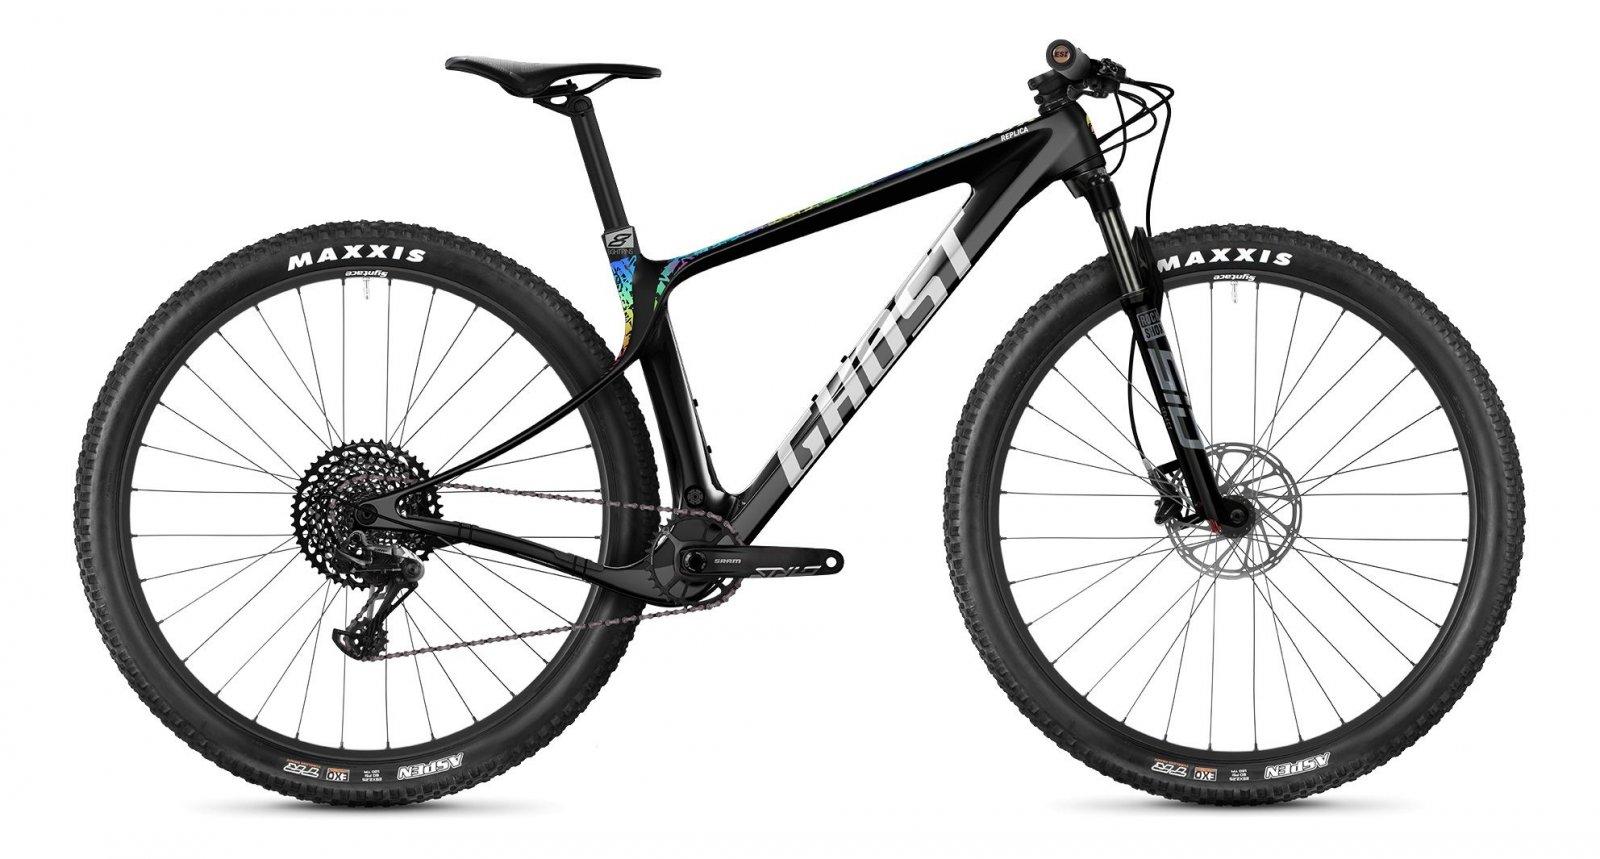 Ghost-lector_sf_uc_wc_replica-_mountain_bike-2021-01.jpg